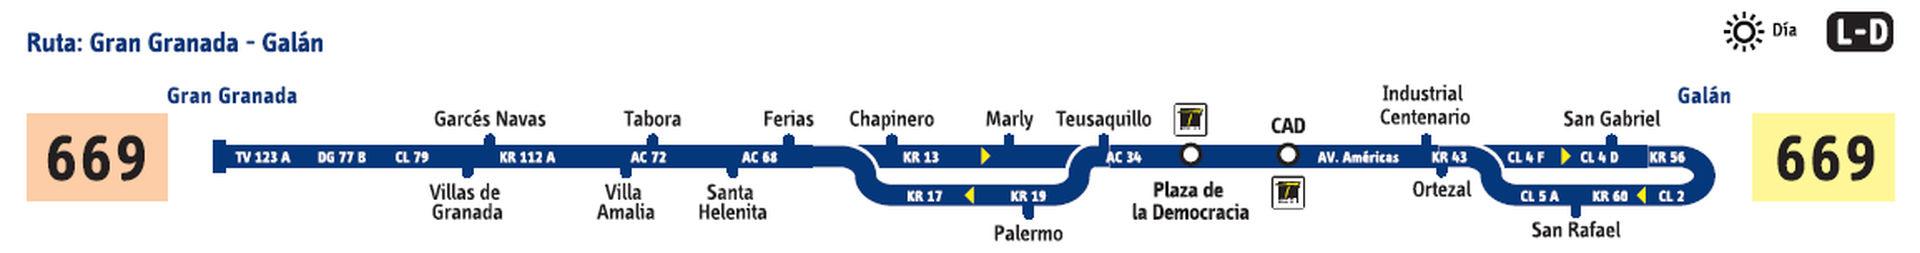 Ruta SITP: 669 Galán ↔ Gran Granada [Urbana] 2